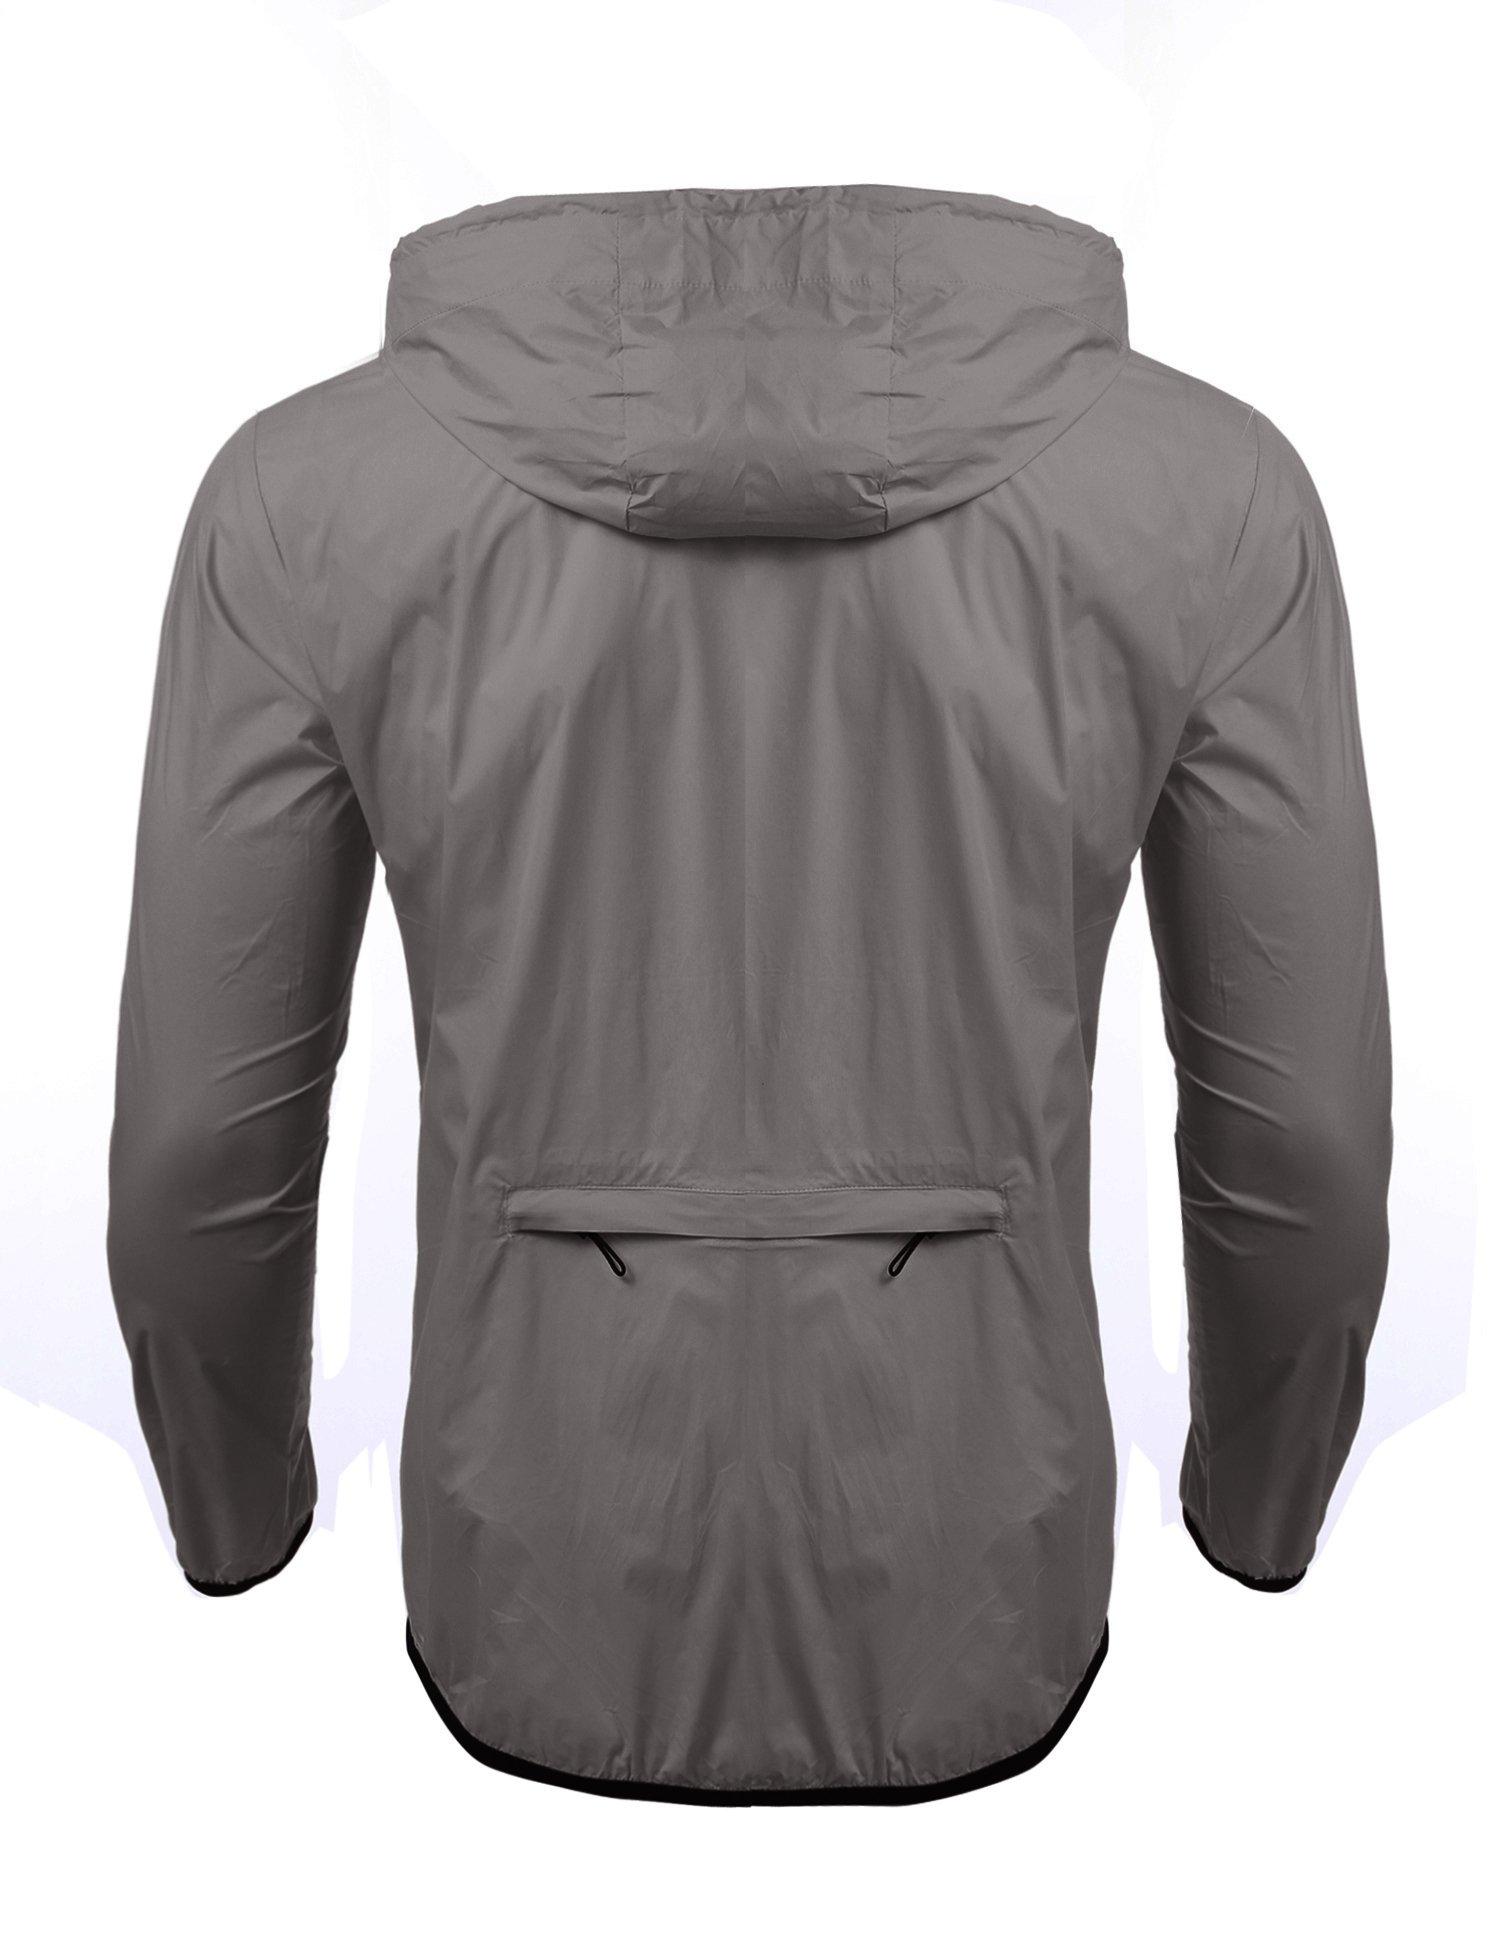 Jinidu Men's Cycling Skin Coat Jersey Bicycle Windproof Jacket Rain Coat (Medium, Light Khaki) by Jinidu (Image #4)